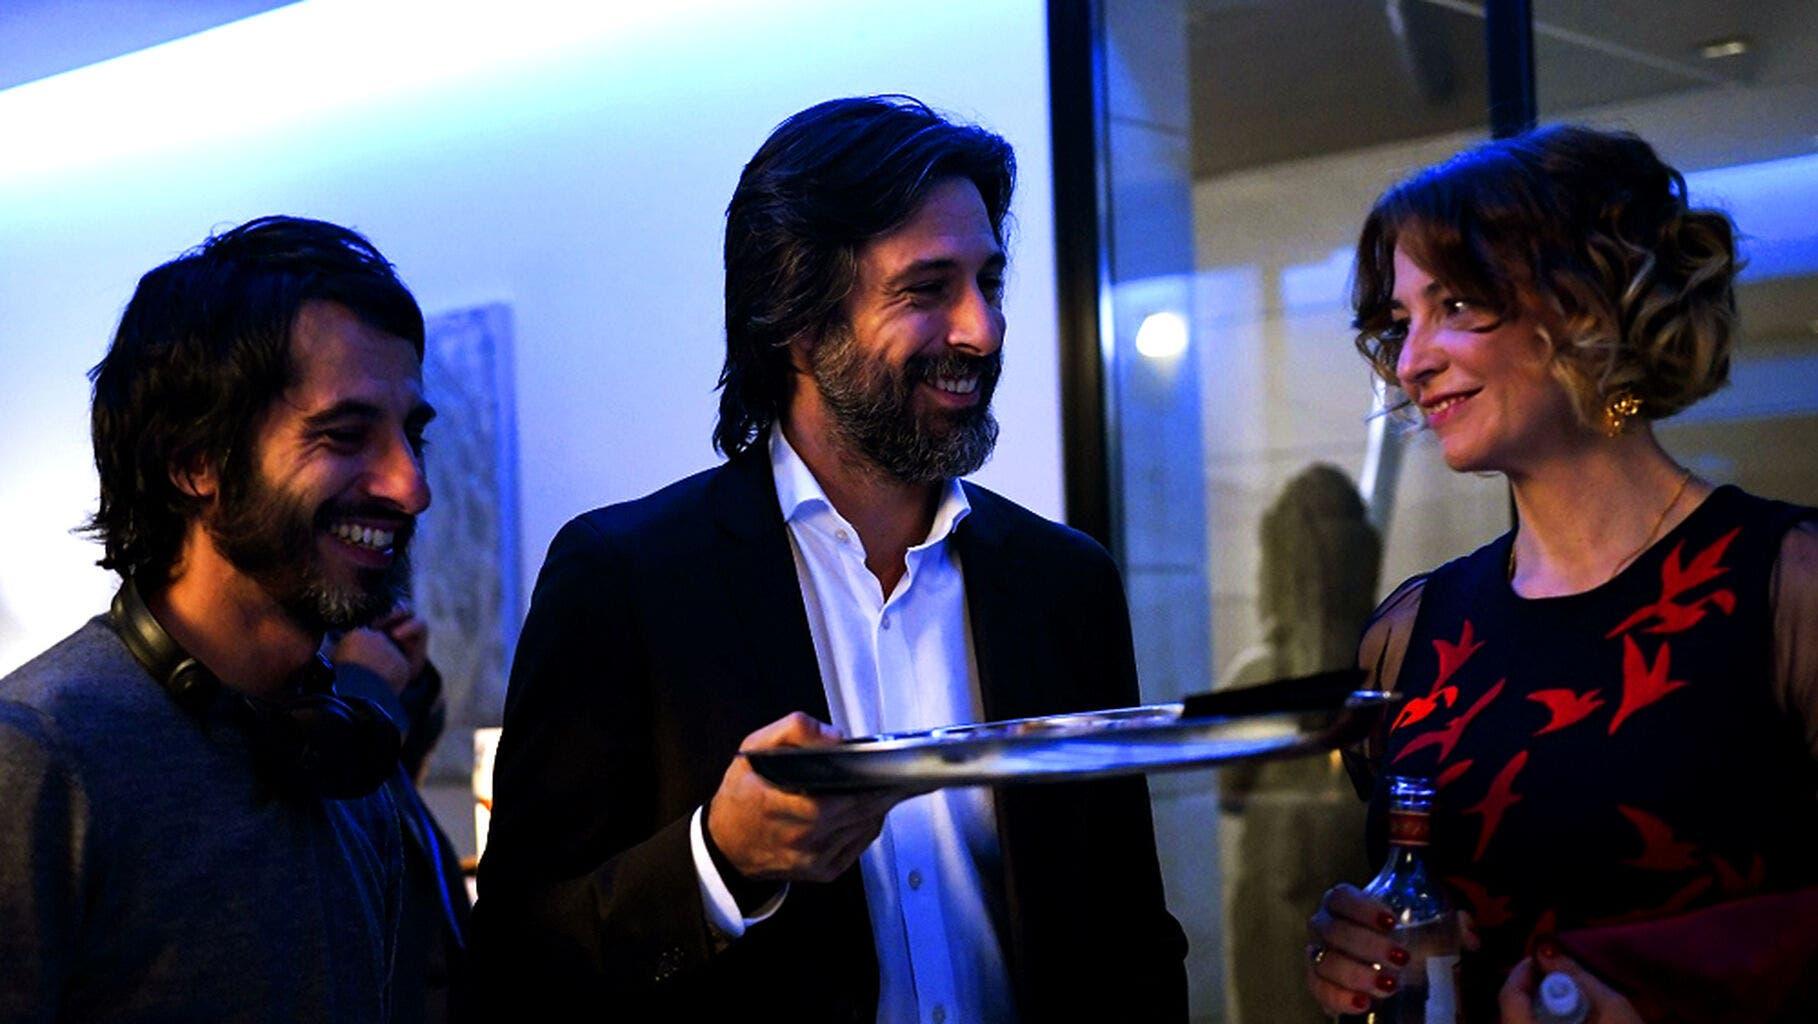 Nasdrovia: La Nouvelle Série Movistar Plus Avec Hugo Silva A